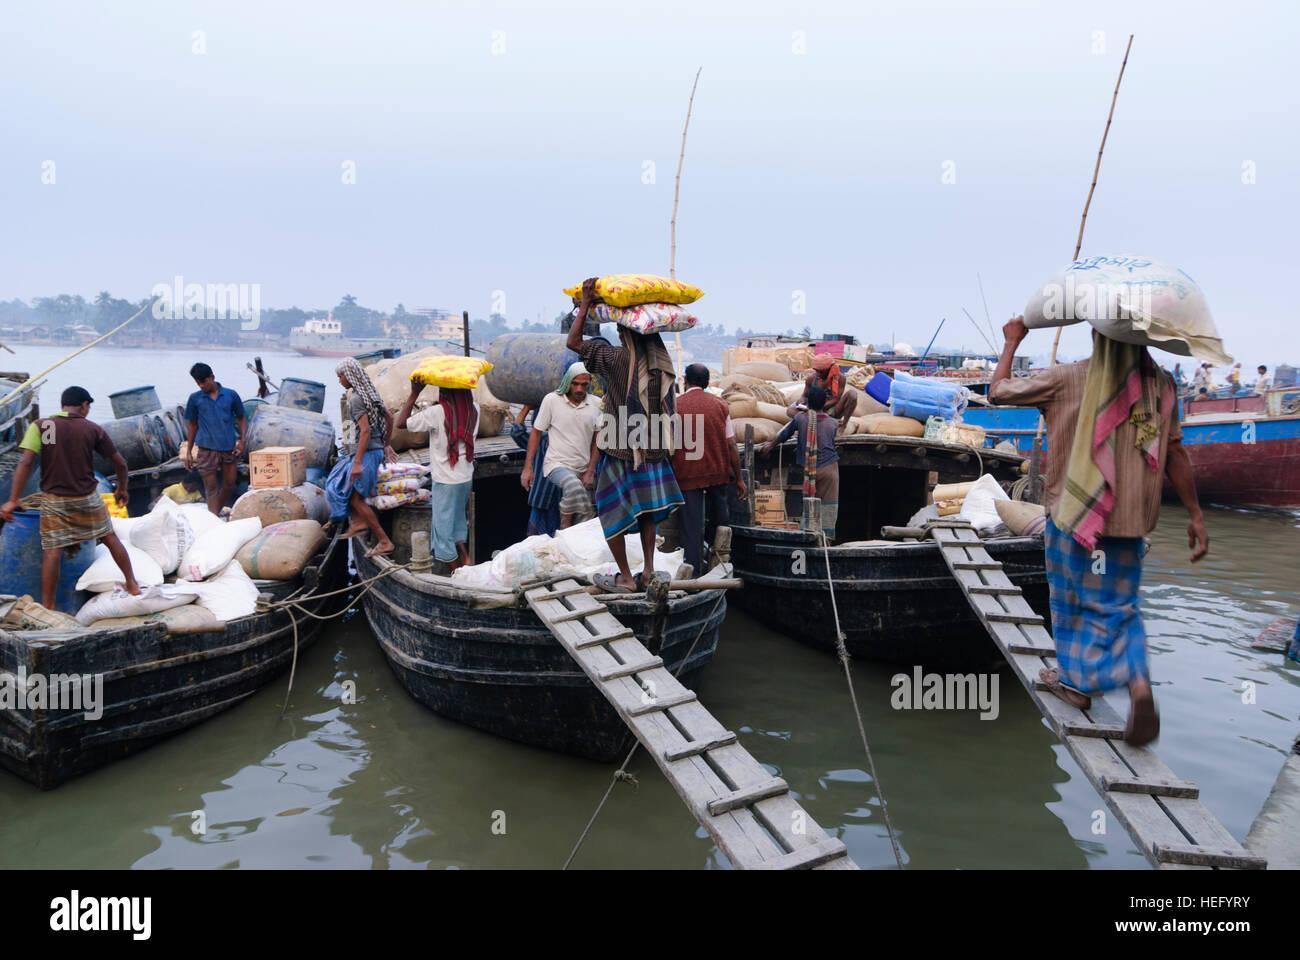 Khulna: porto sul fiume Bhairab, portapacchi con sacchi, Khulna Division, Bangladesh Immagini Stock